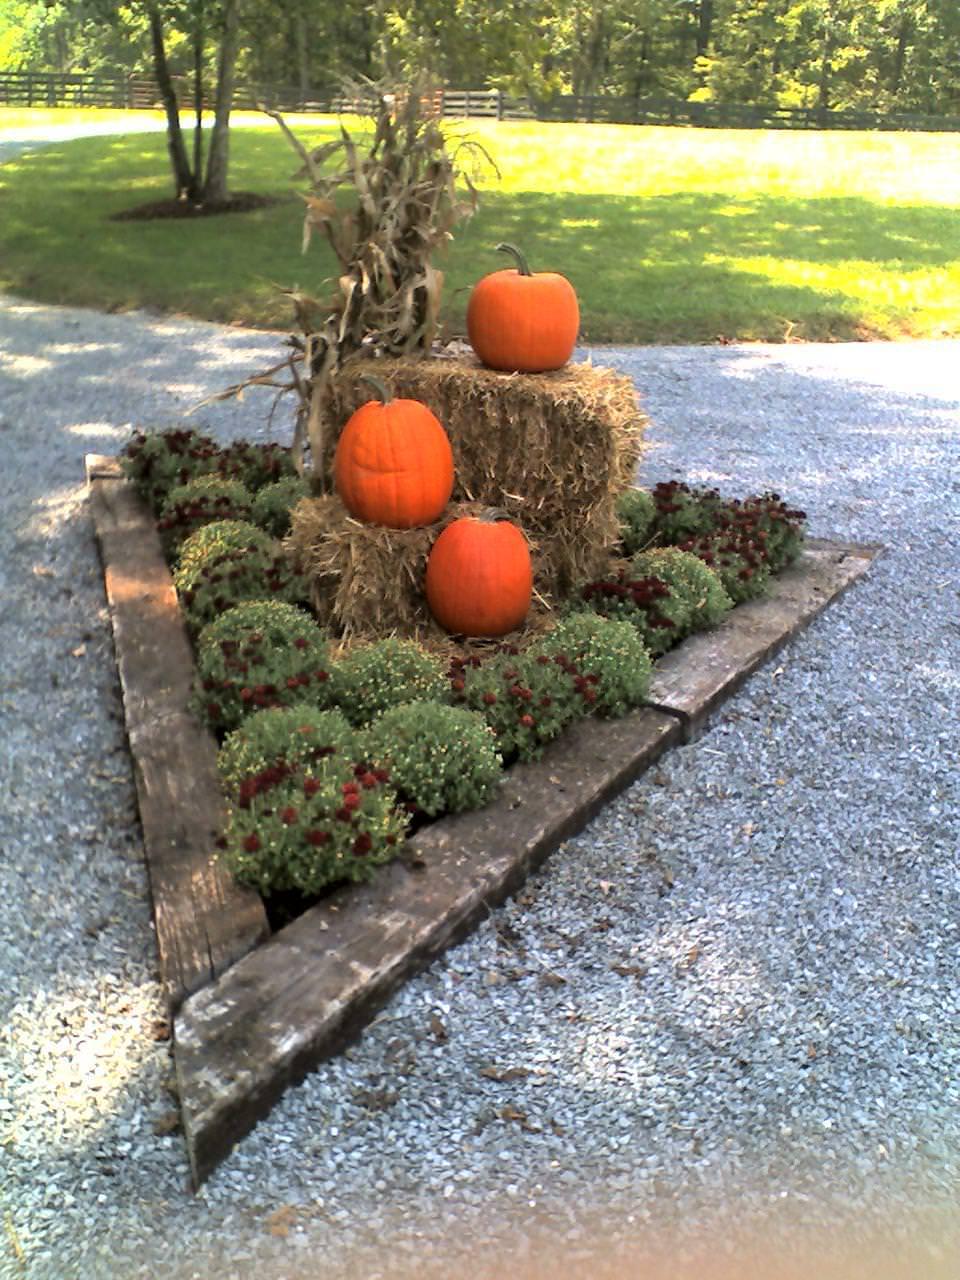 Justin Stelter Landscape Gardening - Seasonal Decorations - 12465574083_b5a932aeba_o.jpg